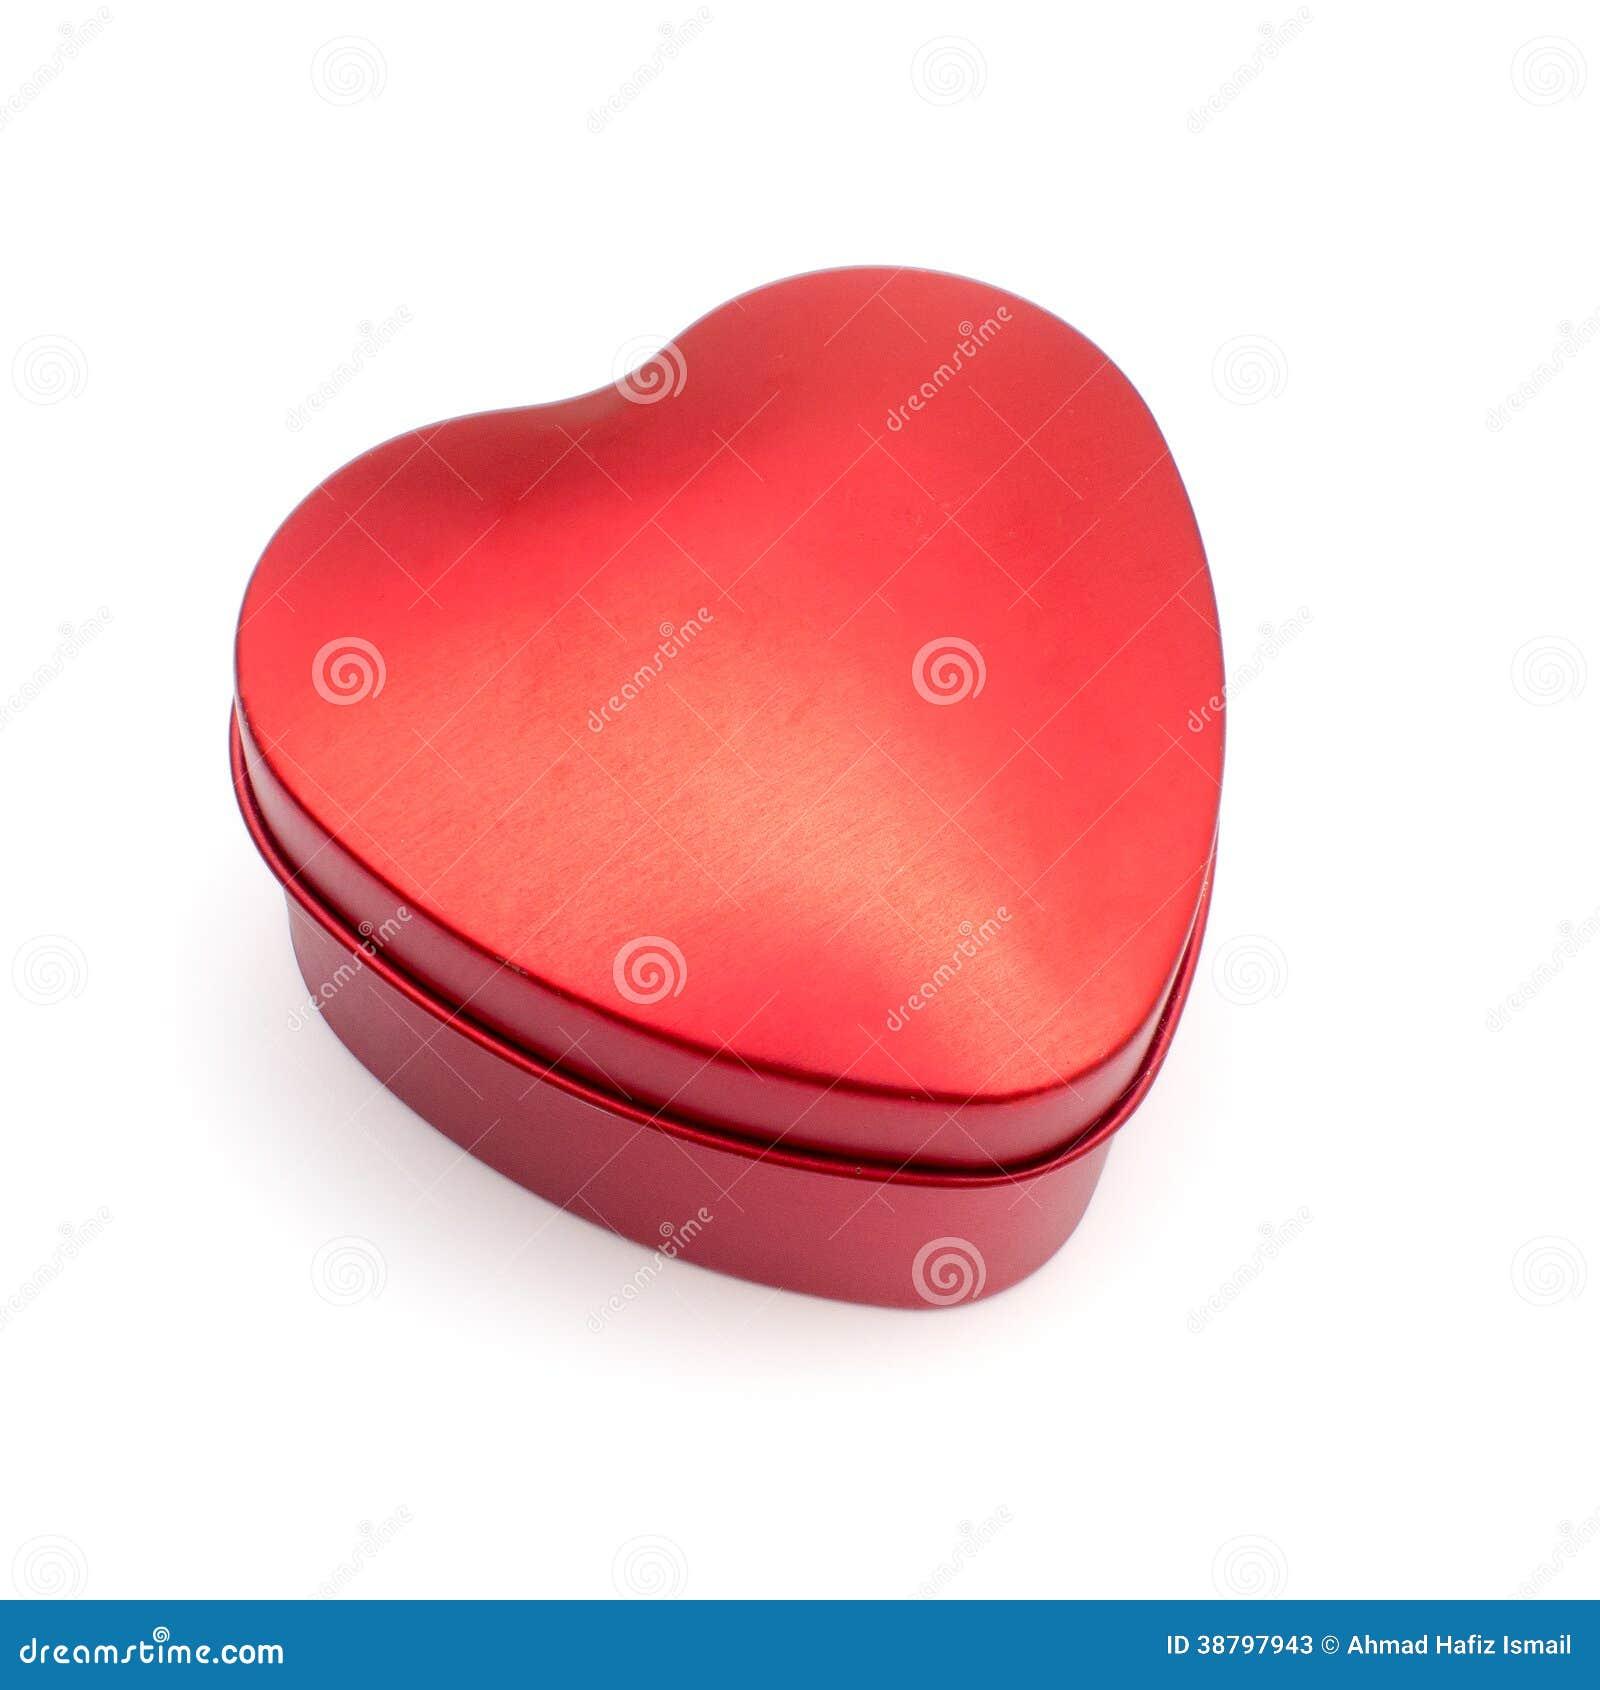 Valentine Day Red Heart Box